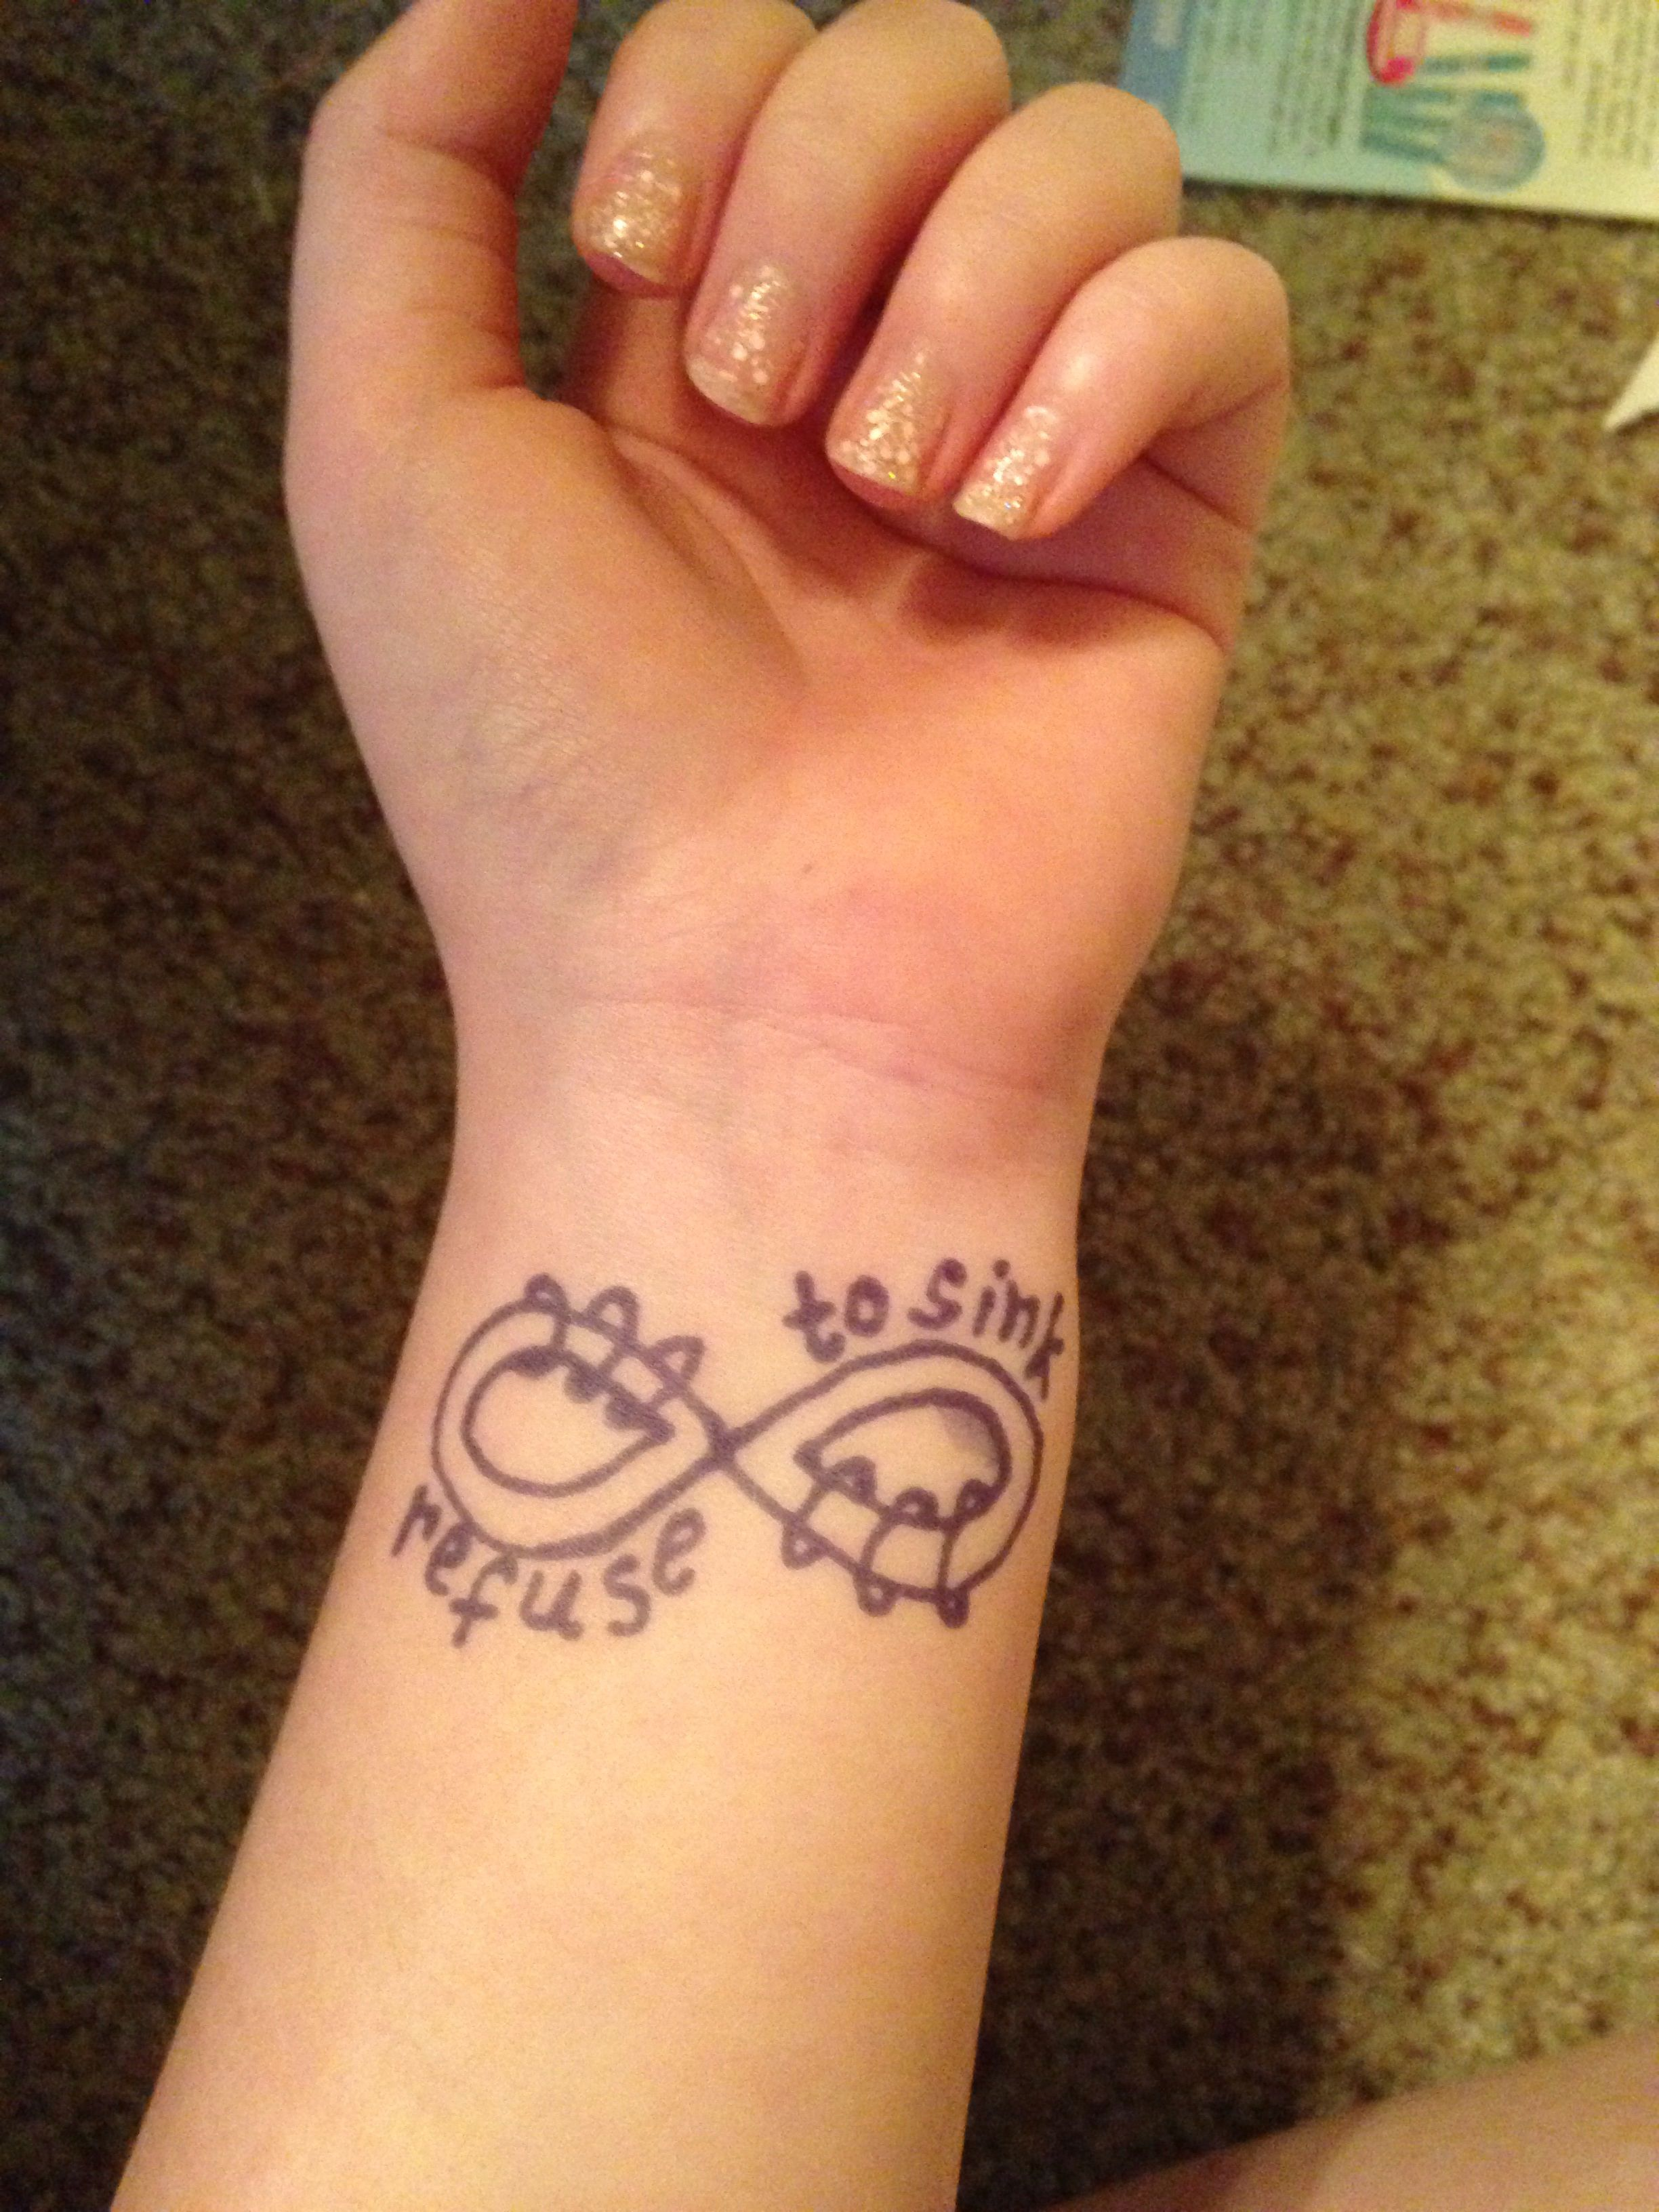 This is my henna tattoo Tattoos Pinterest Hennas and Tattoo